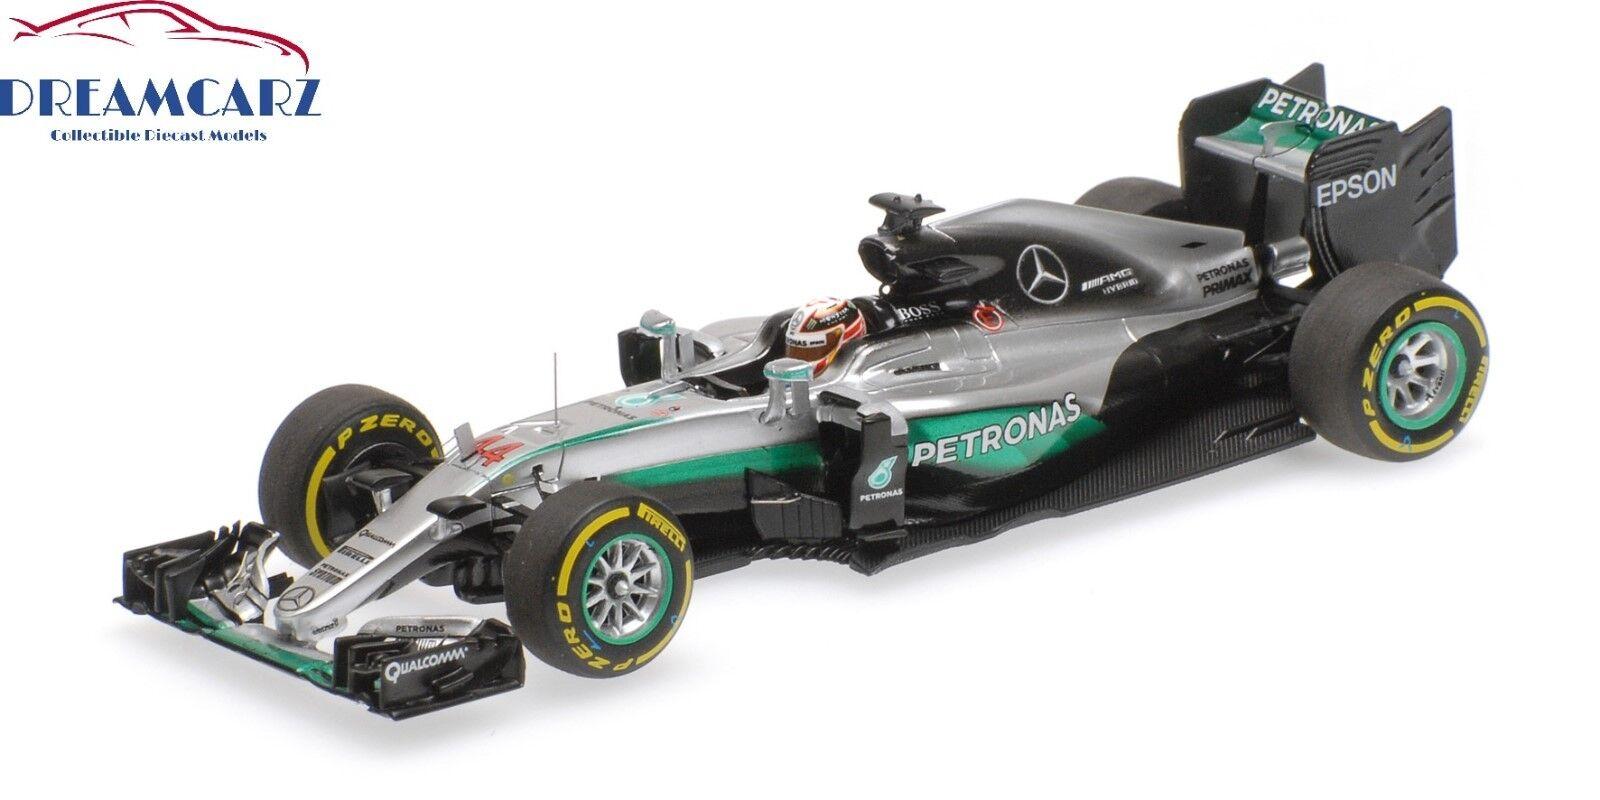 Minichamps 417160744 1 43 Mercedes AMG W07 F1 2016 Abu Dhabi Lewis Hamilton